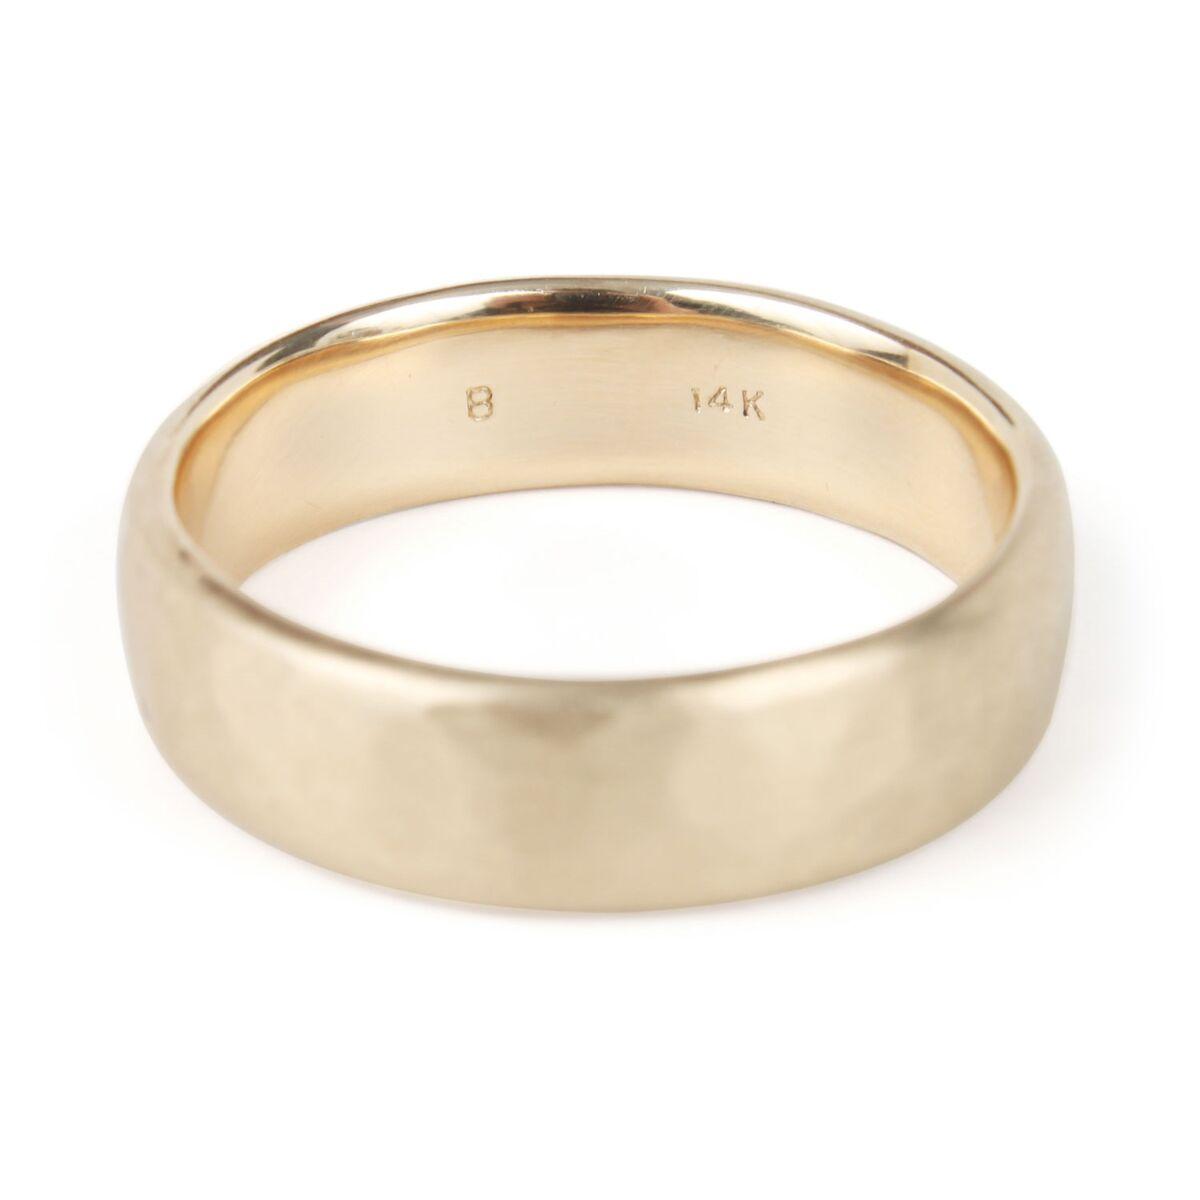 Cowboy Ring, 7mm image